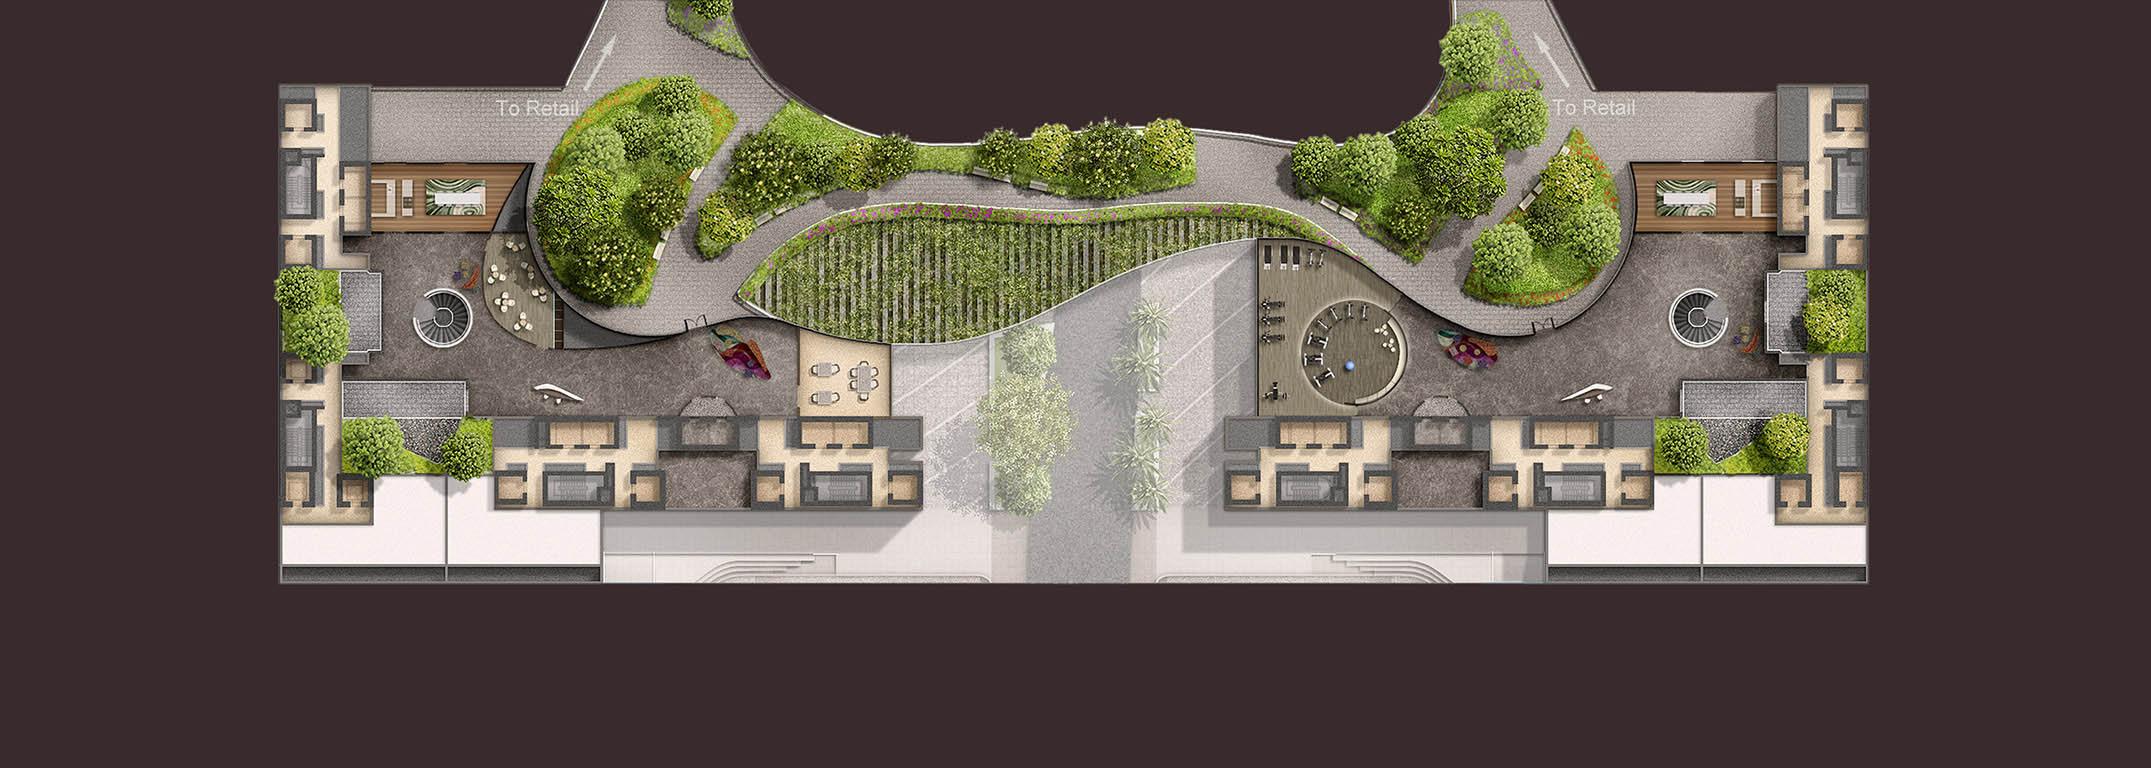 Site Plan Level 2